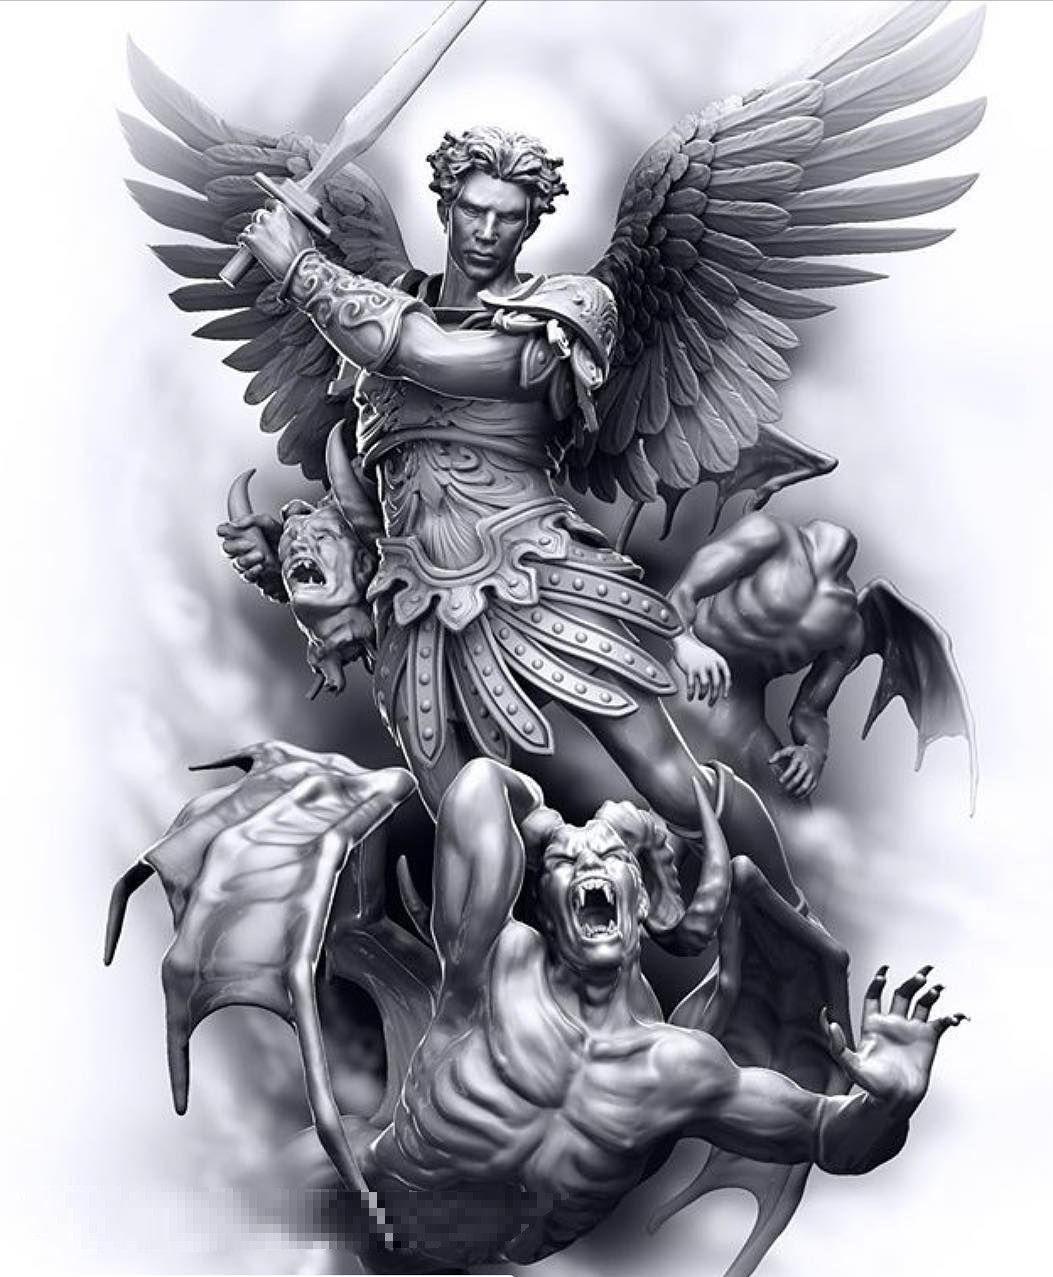 807 Best Lucifer Images On Pinterest: Пин от пользователя Даниил Новиков на доске 33 богатыря